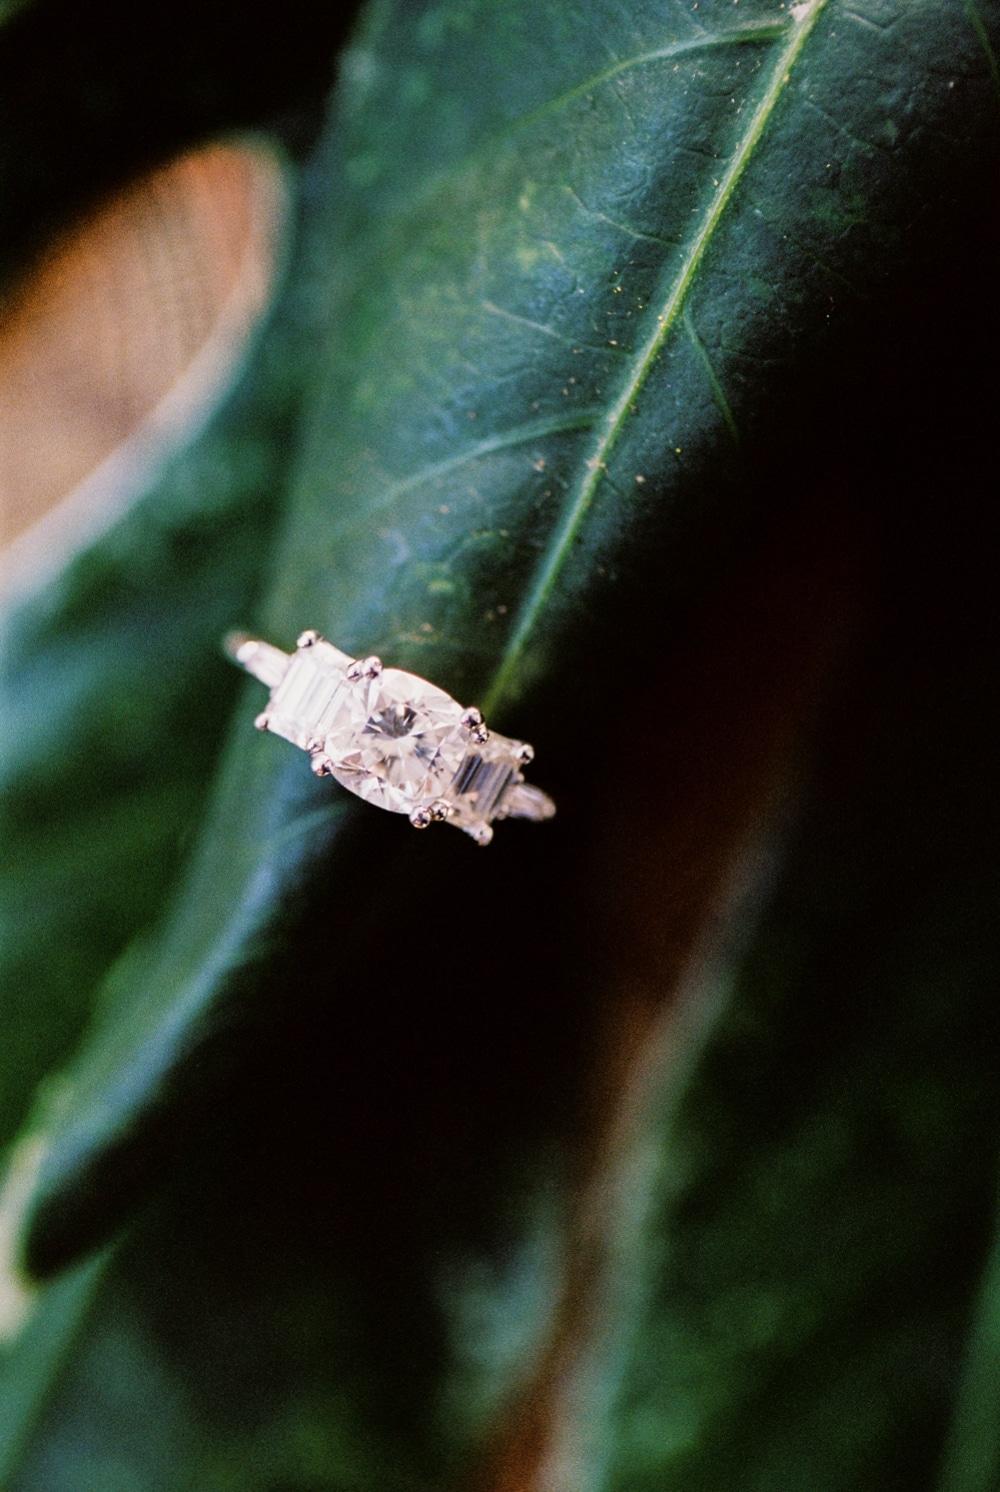 kristin-la-voie-photography-Austin-wedding-photographer-matties-green-pastures-21